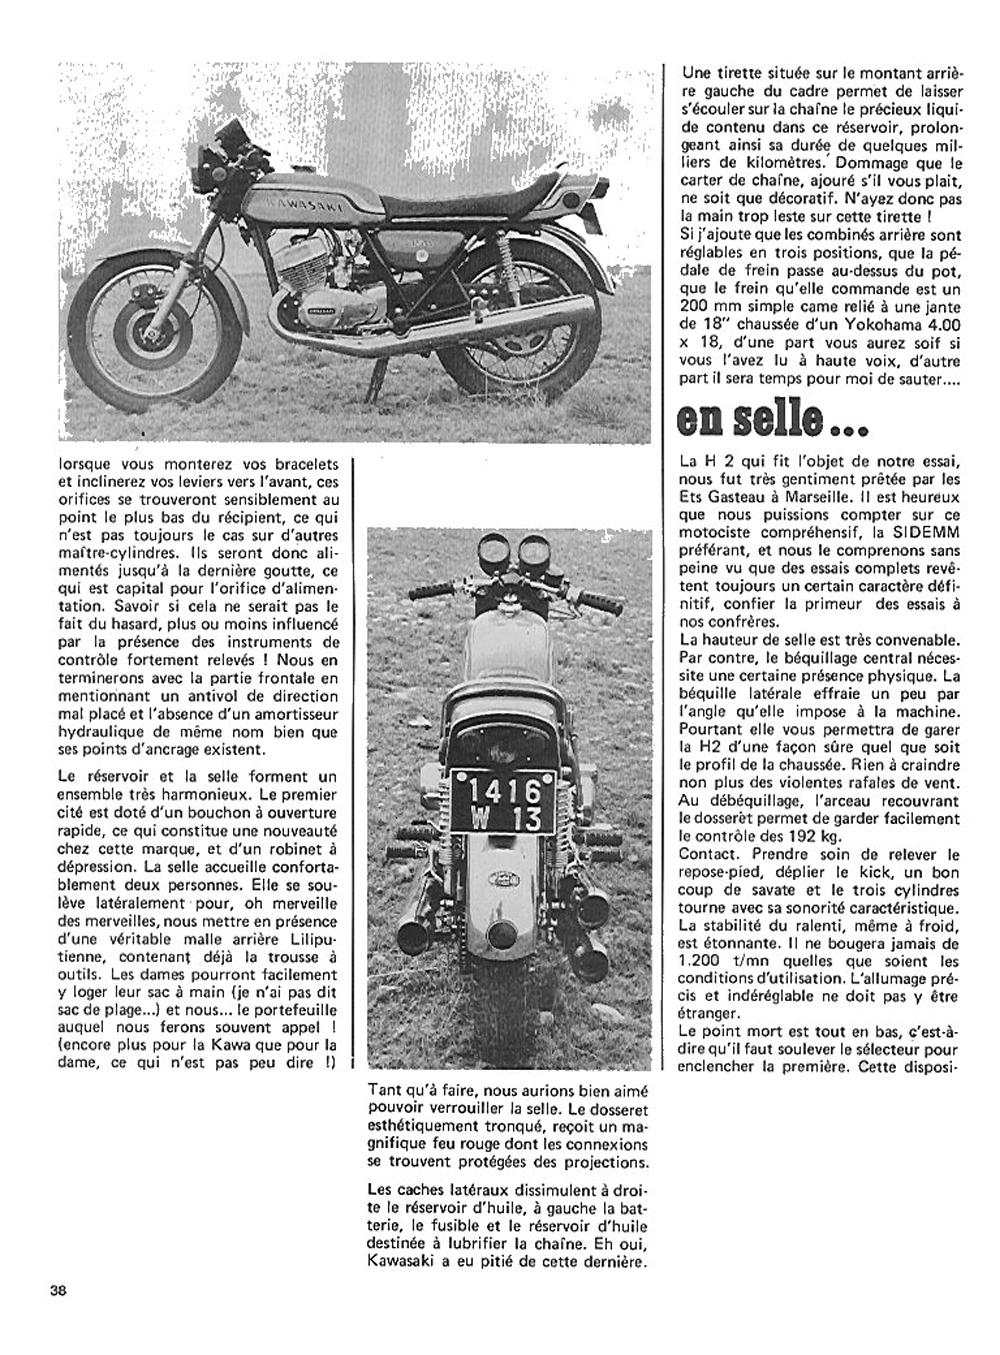 1972 Kawasaki H2 750 road test france 03.jpg